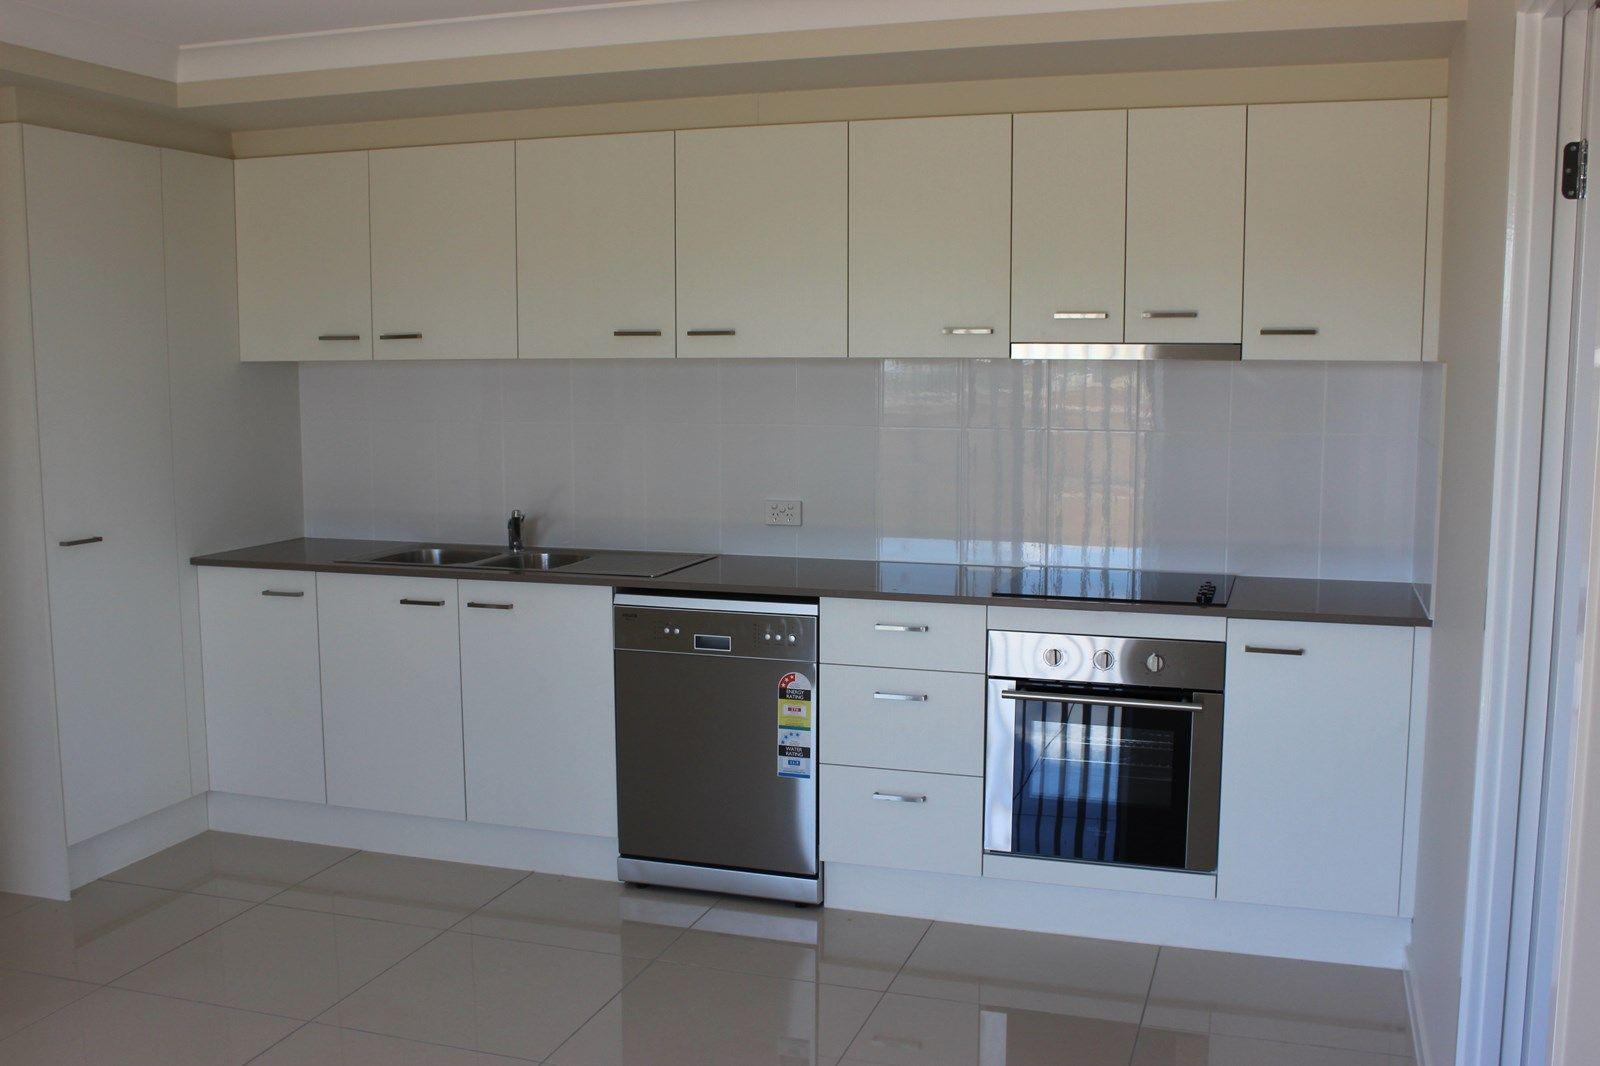 2/10 WEEBAH Place, Cambooya QLD 4358, Image 1